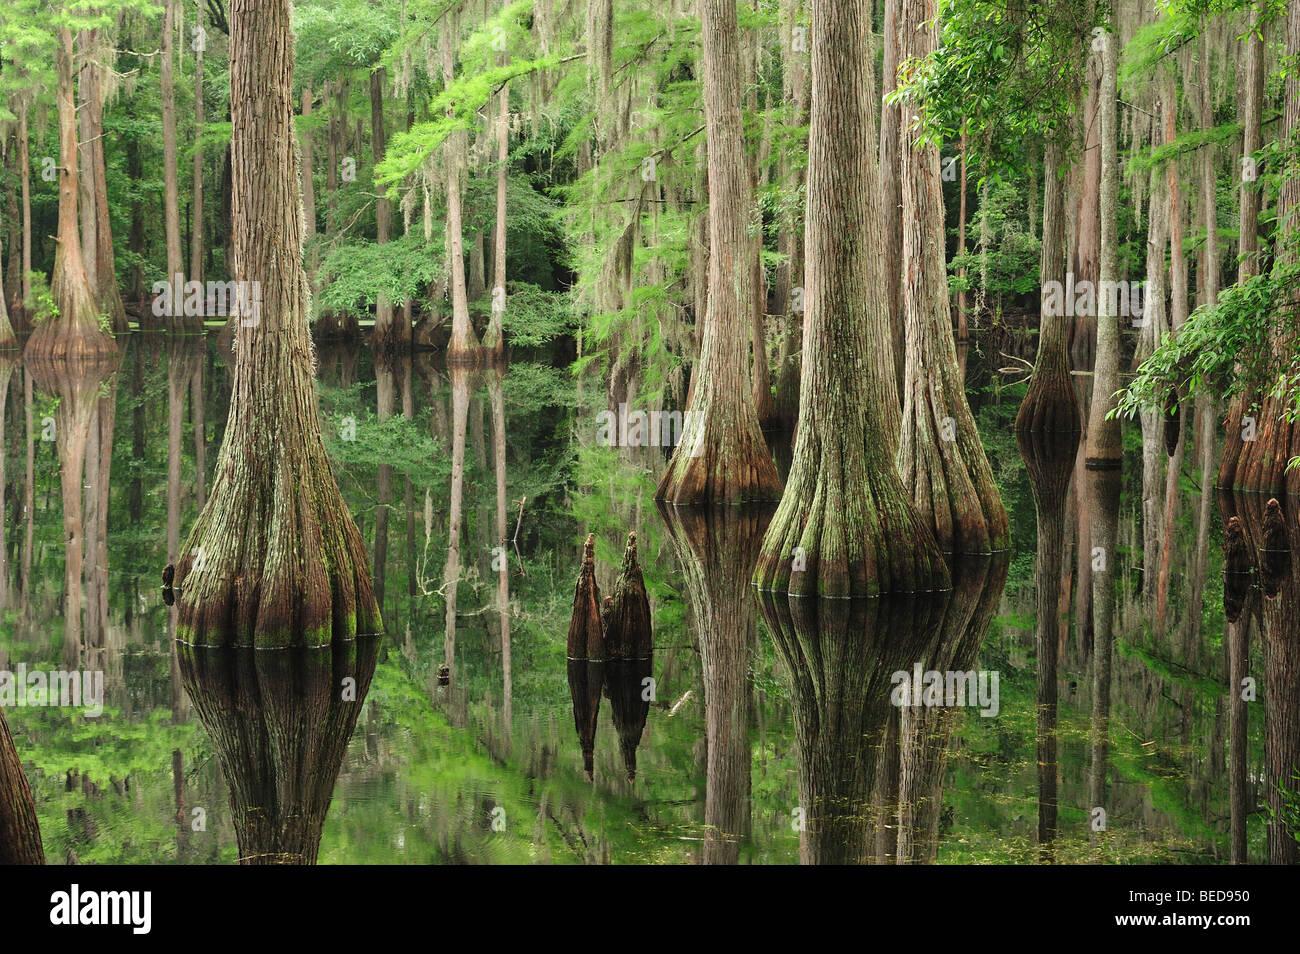 Bald cypress, Taxodium distichum, Lake Bradford, Florida - Stock Image